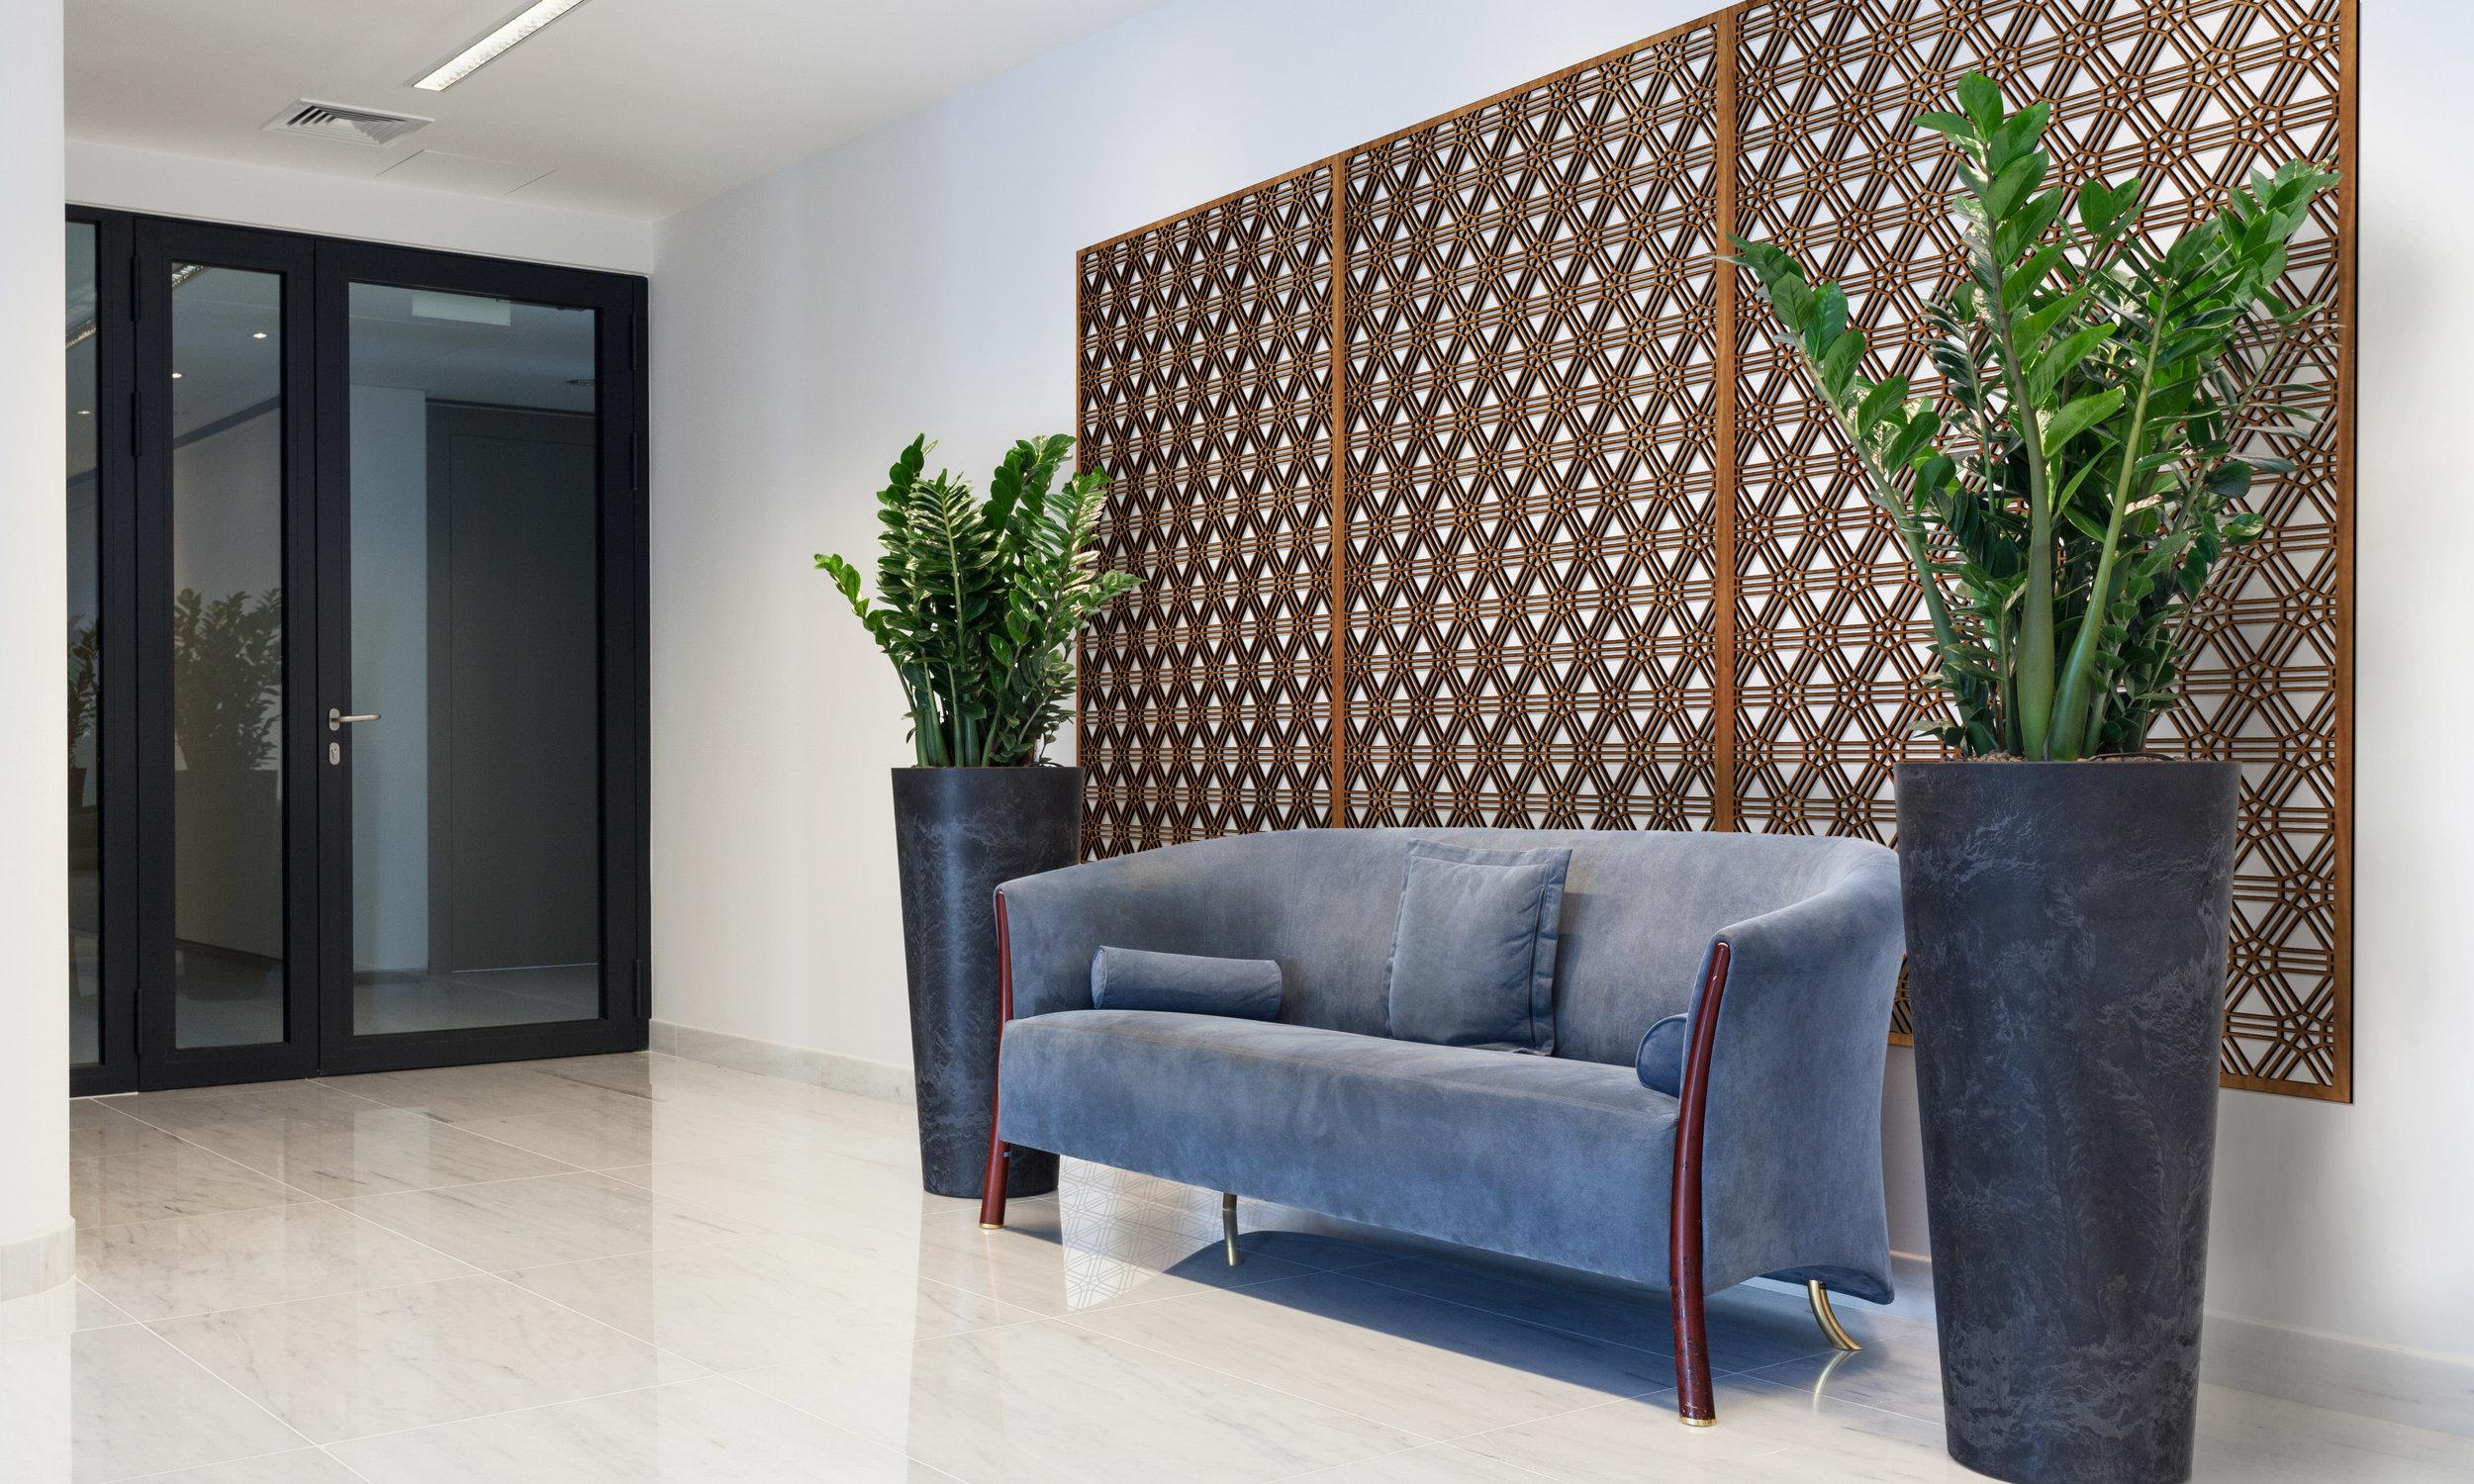 Installation Rendering A   Interlocking Wheels decorative office wall panel - shown in Cherry